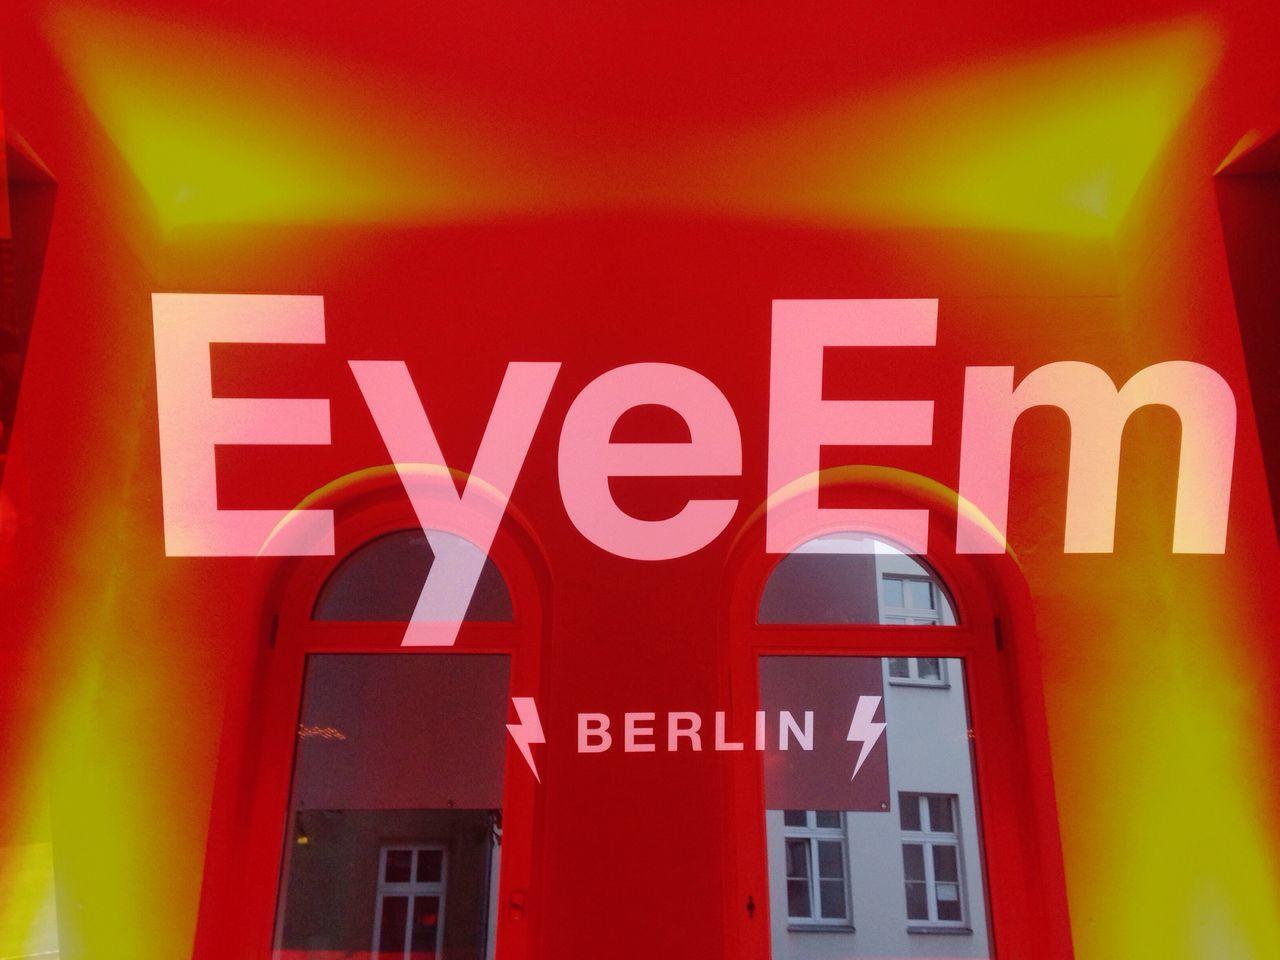 Eyeemfestival16 EyeEmFestival Eyeemawards16 EyeEmAwards16!